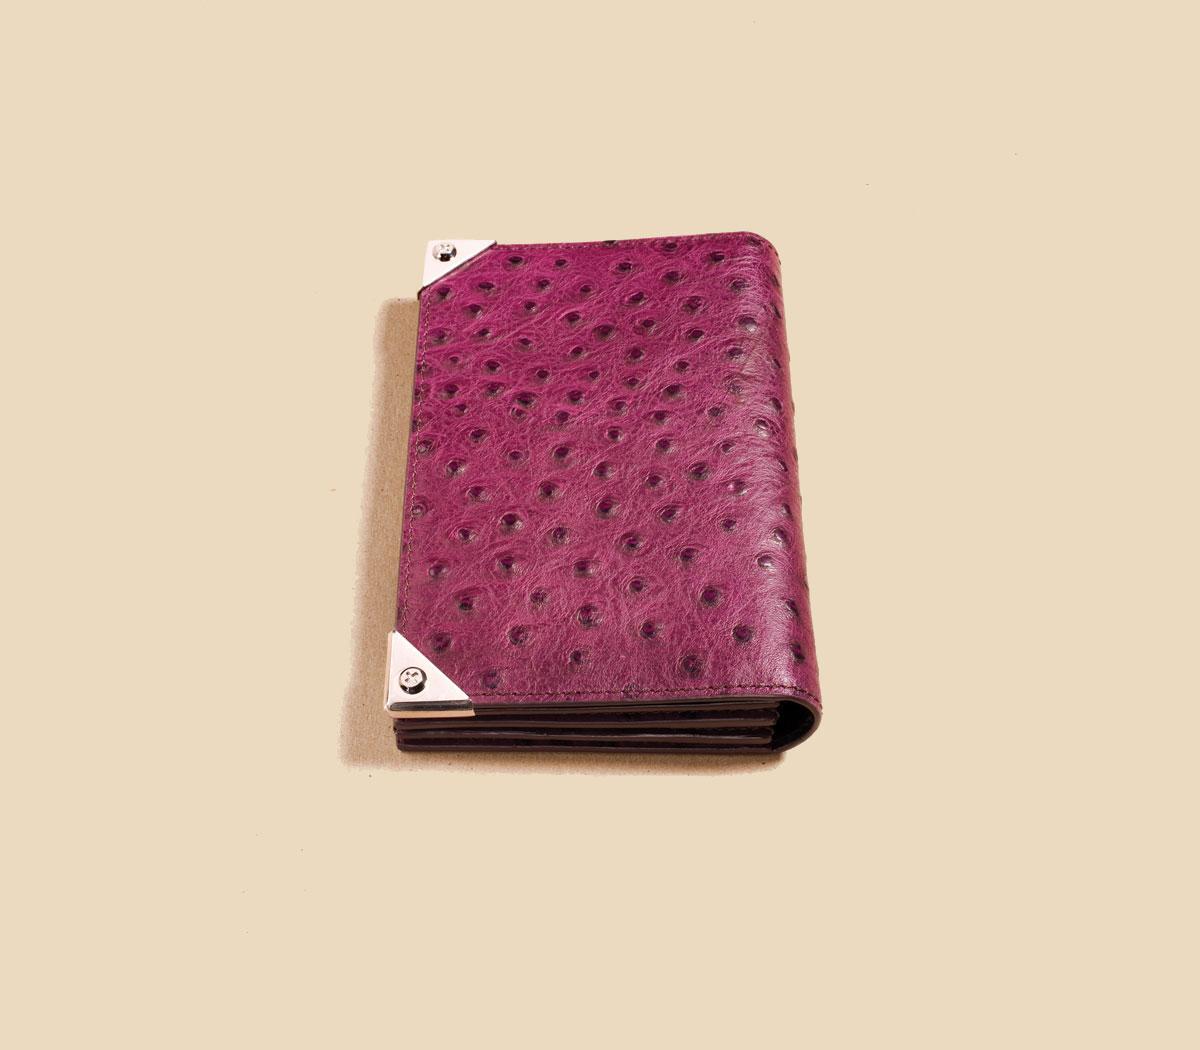 m08-accessoires-portefeuille-alexander-wang-holt-renfrew